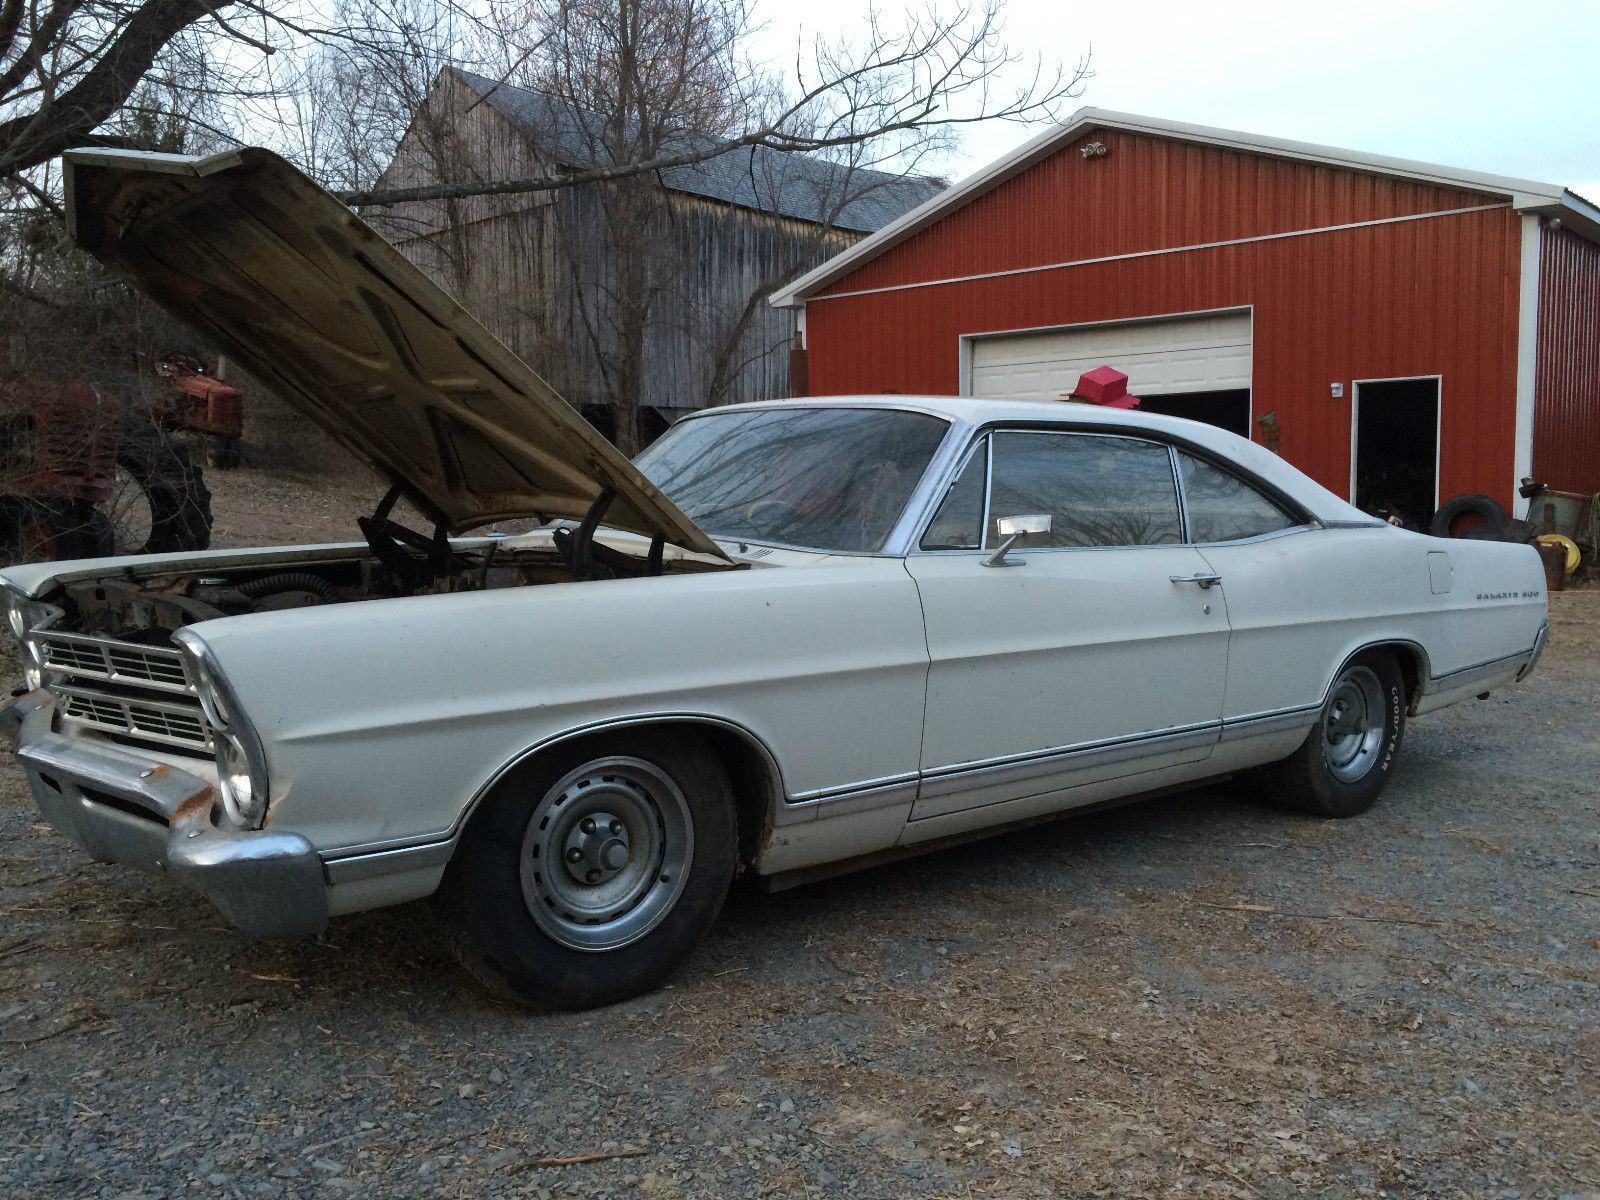 1967 Ford Galaxie 500 2 Door Barn Find Straight Body